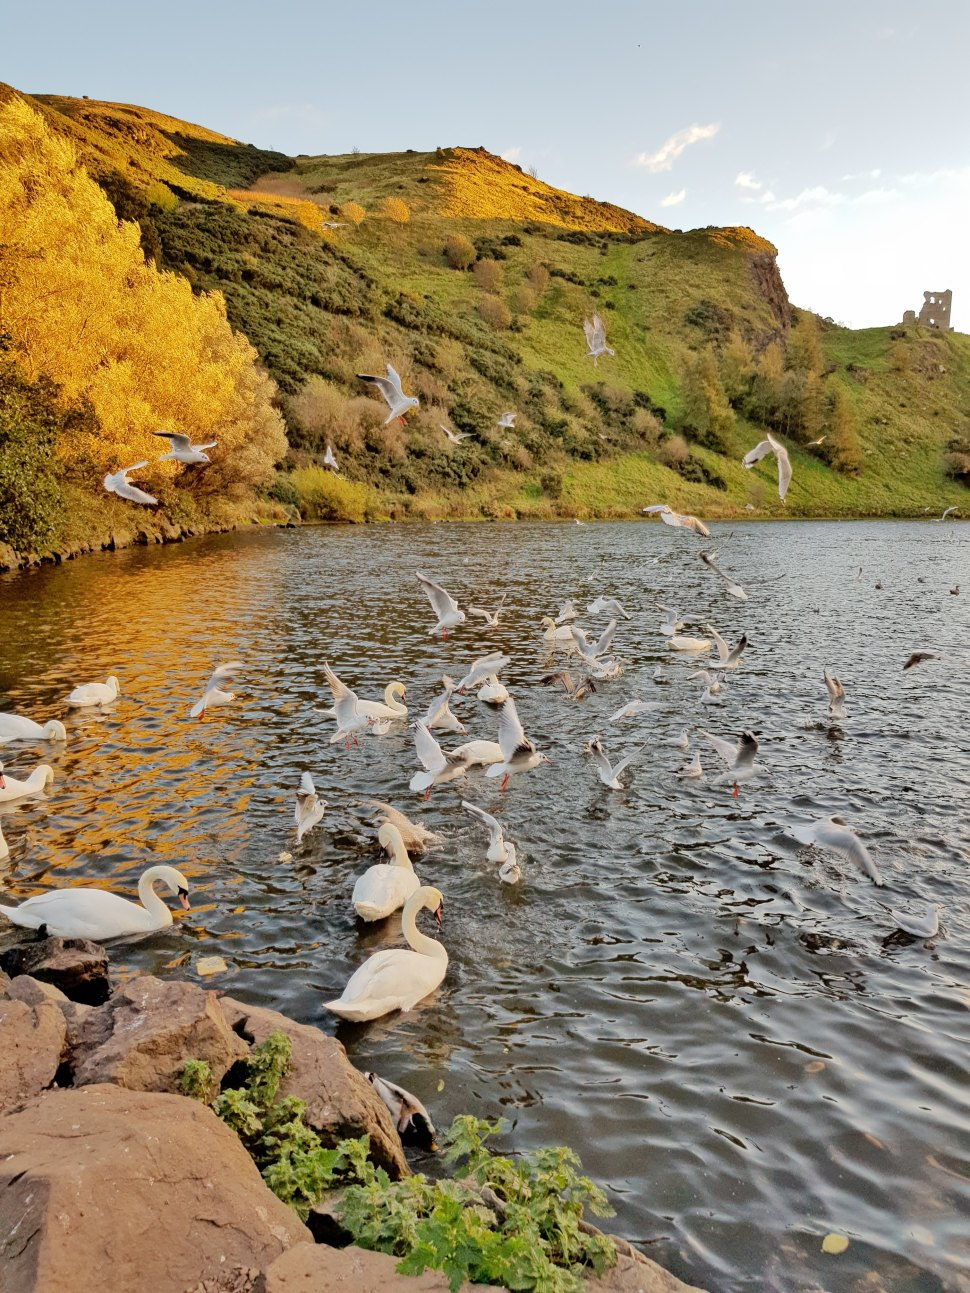 lisa-wheatley-swans-430332-unsplash.jpg